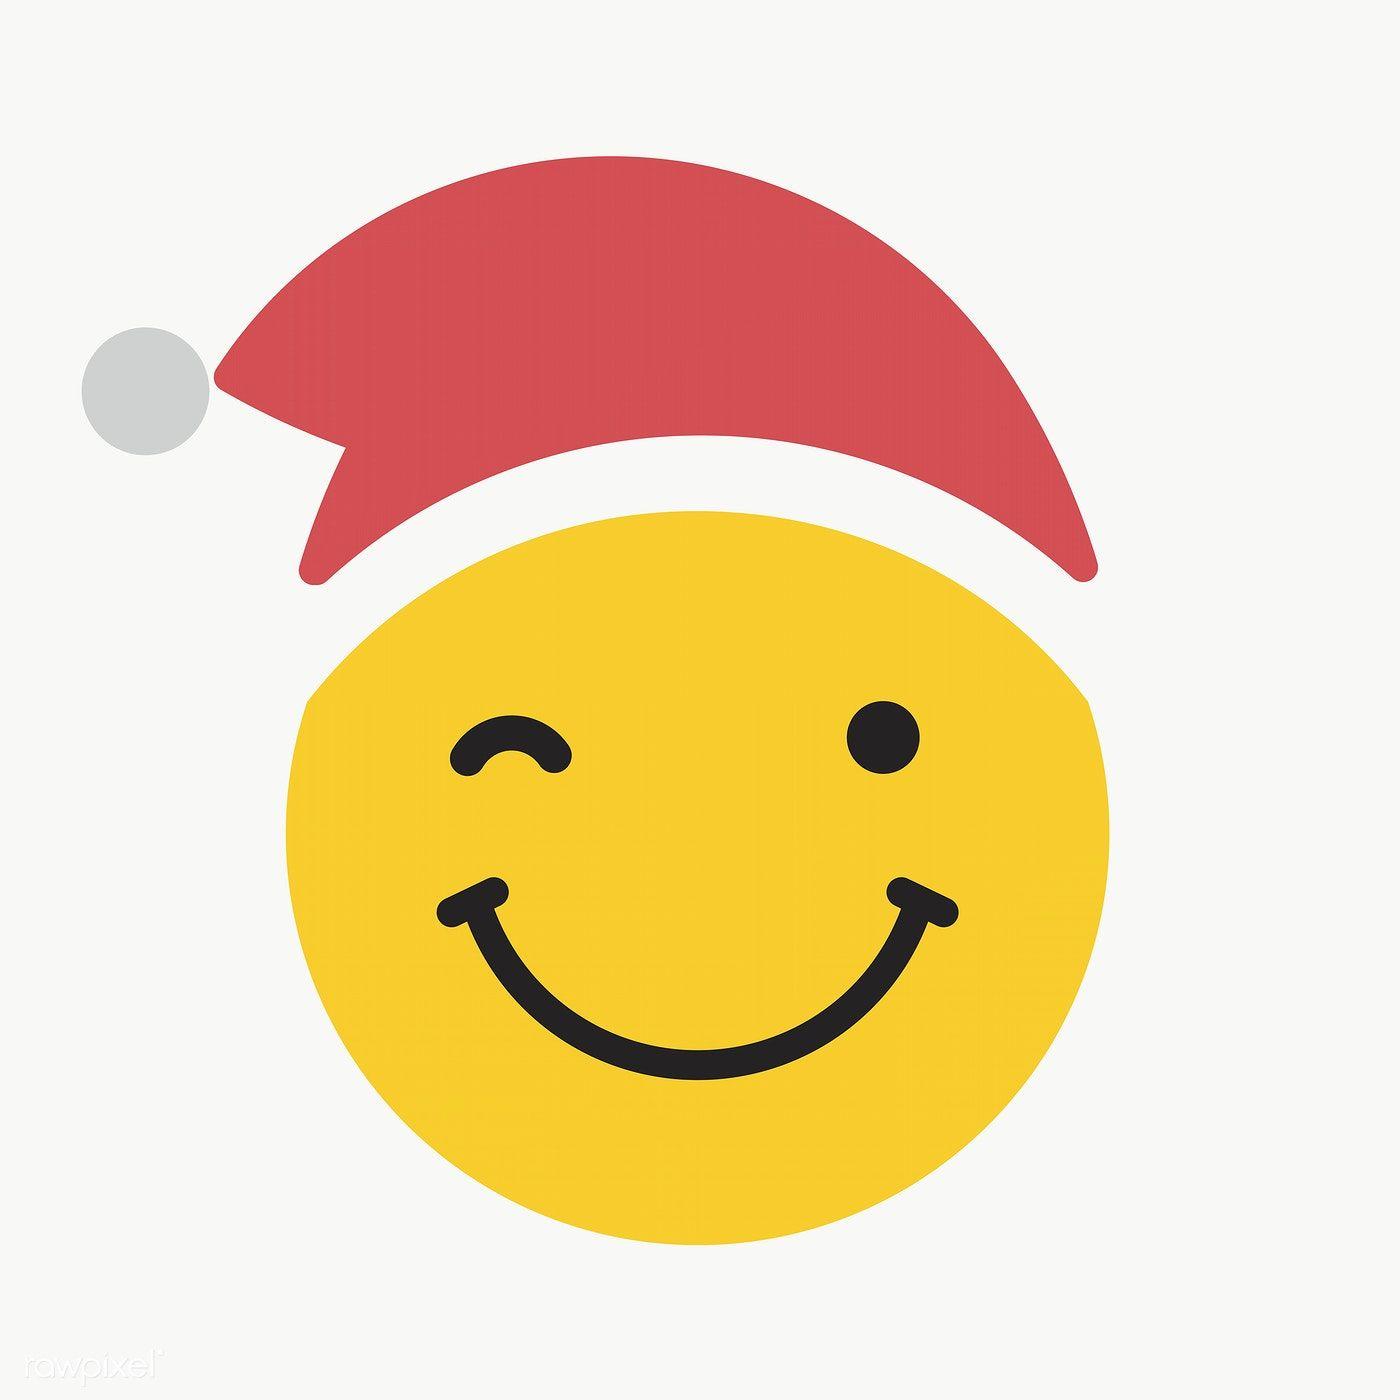 Download Premium Png Of Round Yellow Santa With Winking Face Emoticon On Winking Face Emoticon Emoji